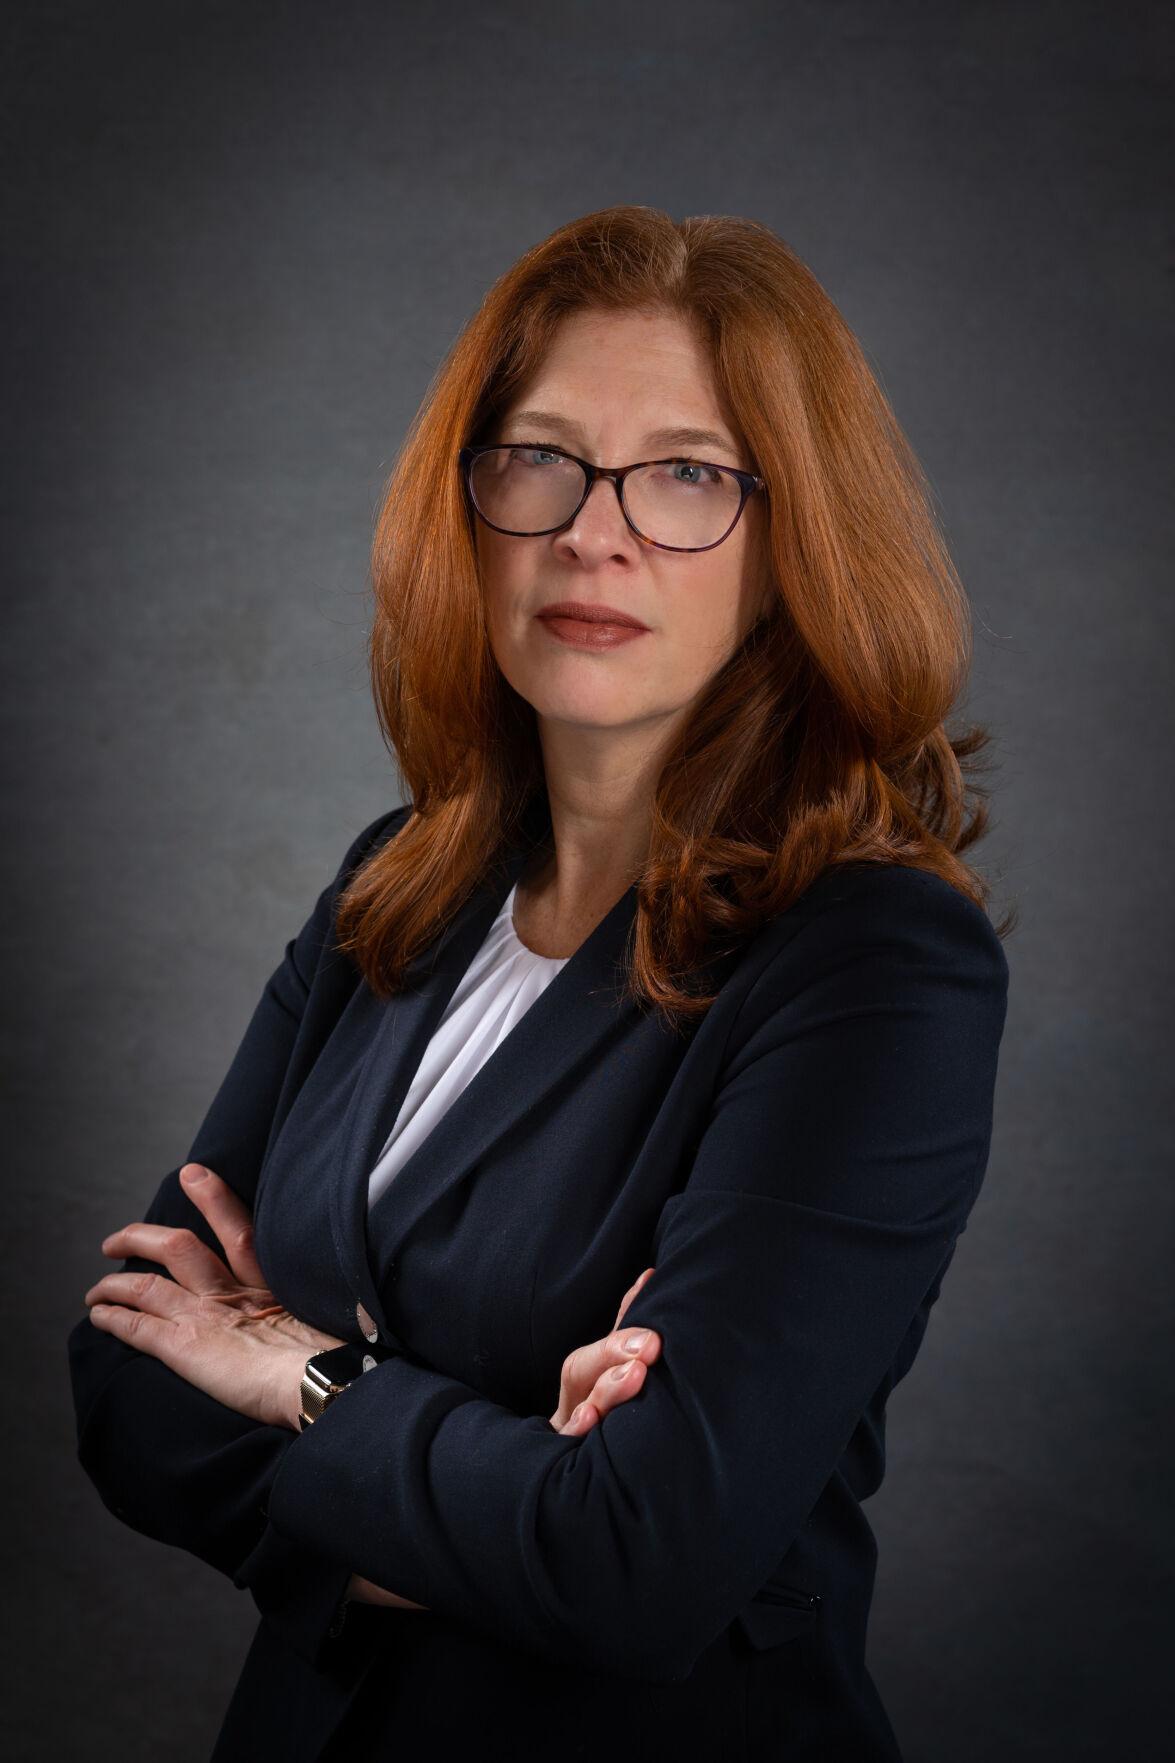 Prosecutor Robeson Photo.jpg